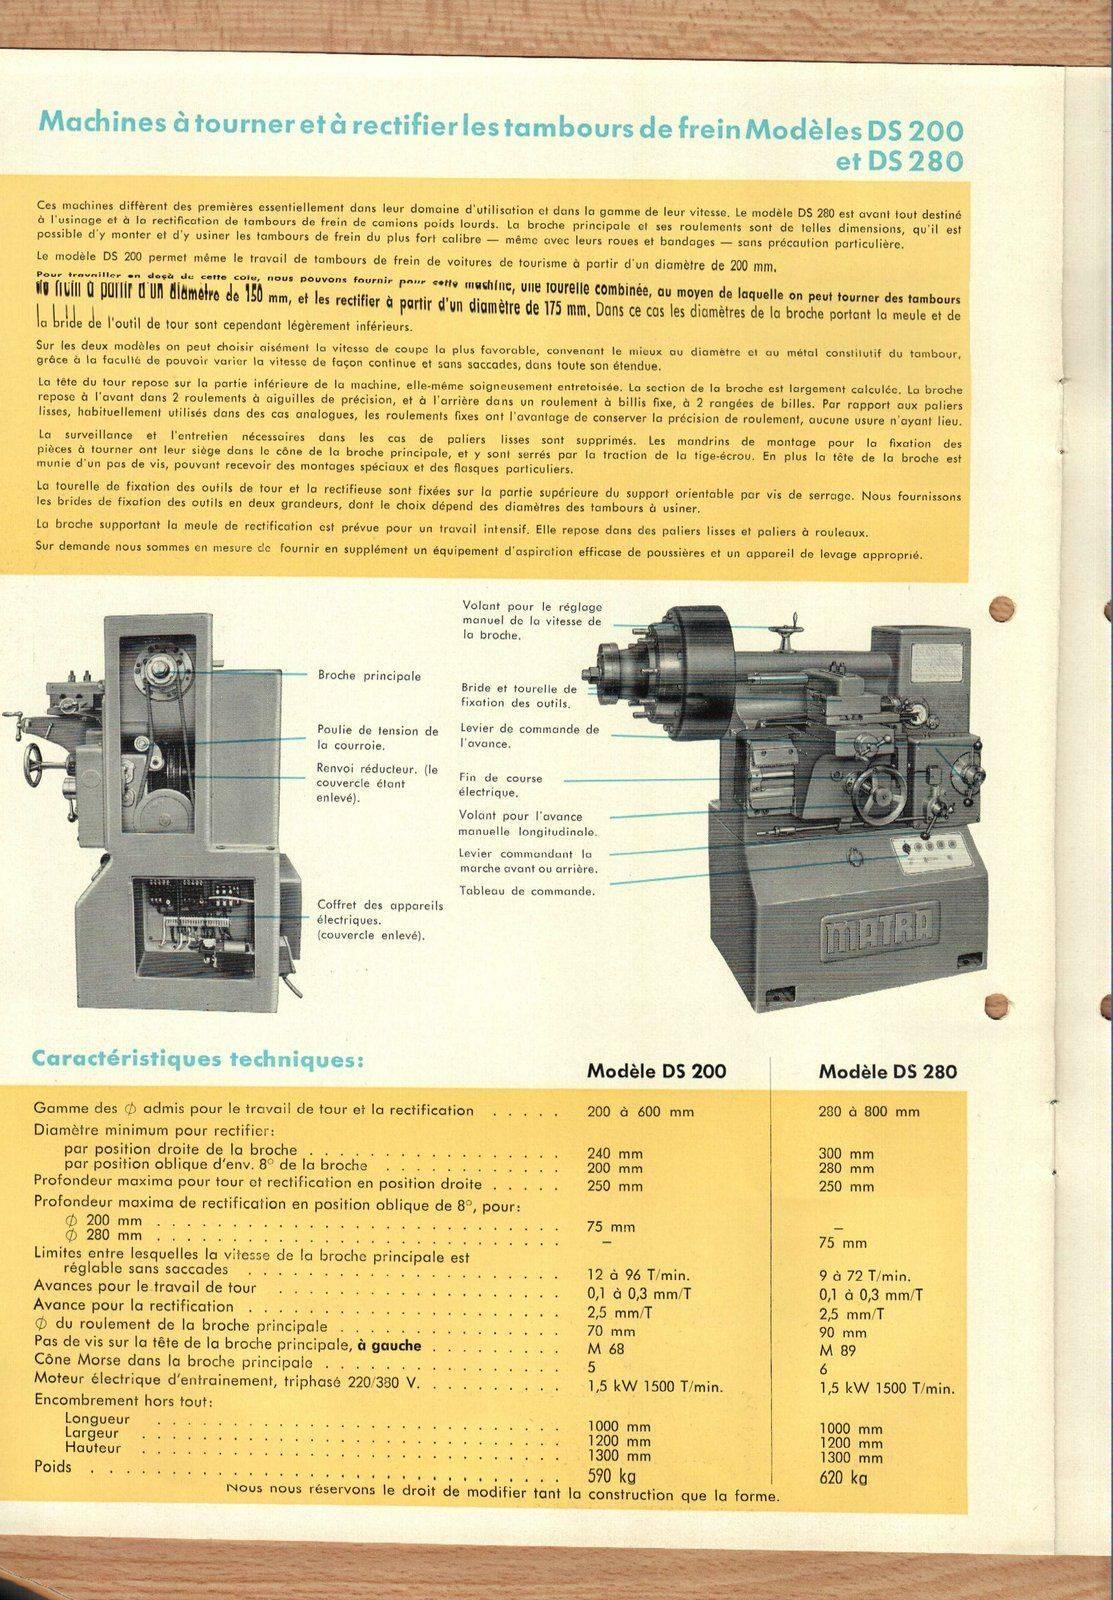 PTDC0219.JPG